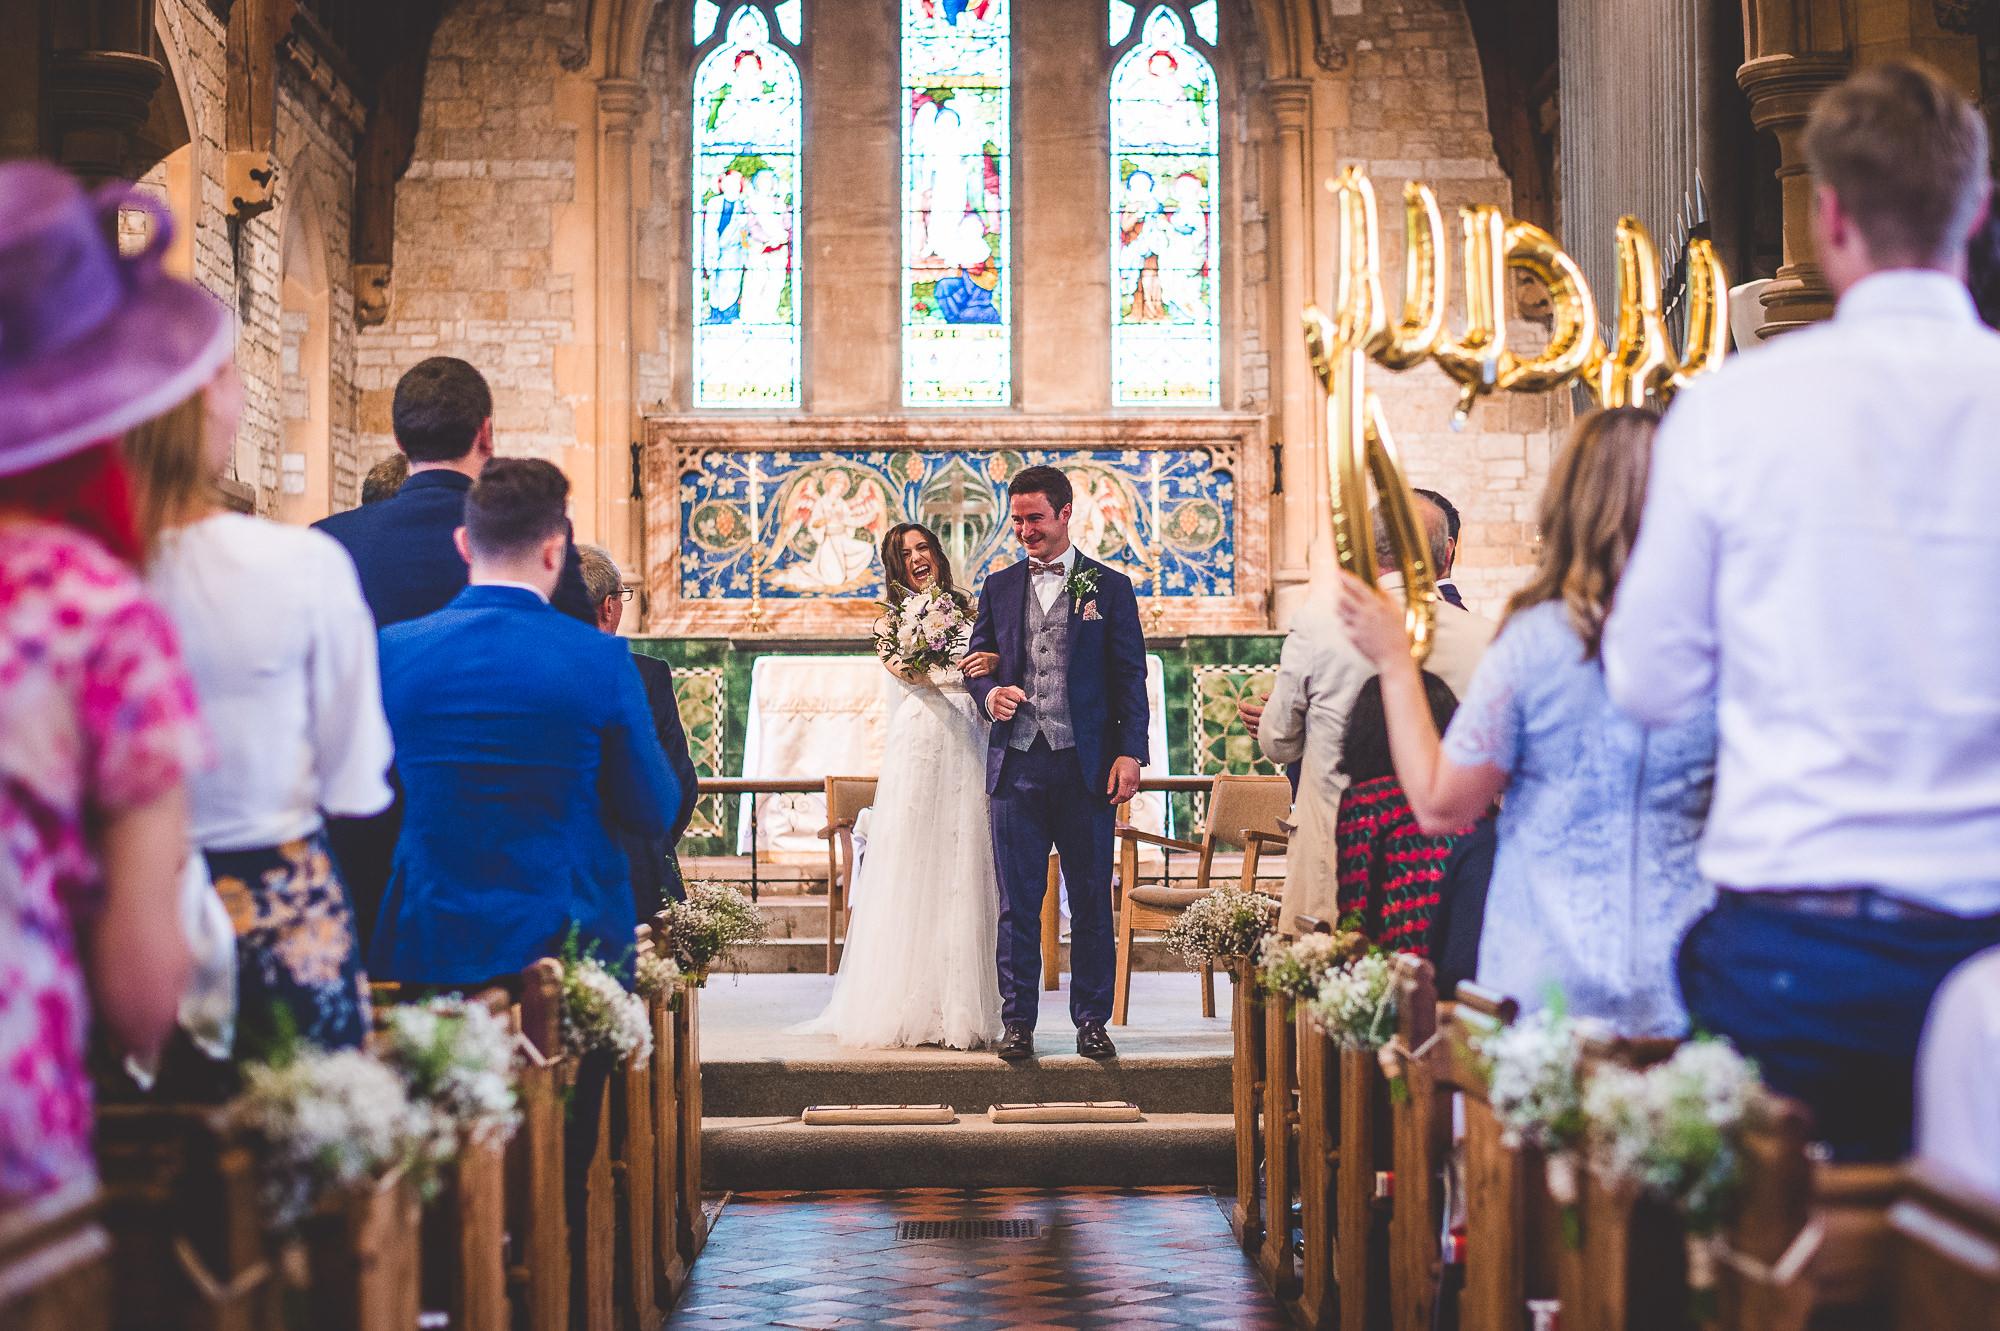 Veils & Bales Wedding Photography | Charlie & Steve SCSS 081